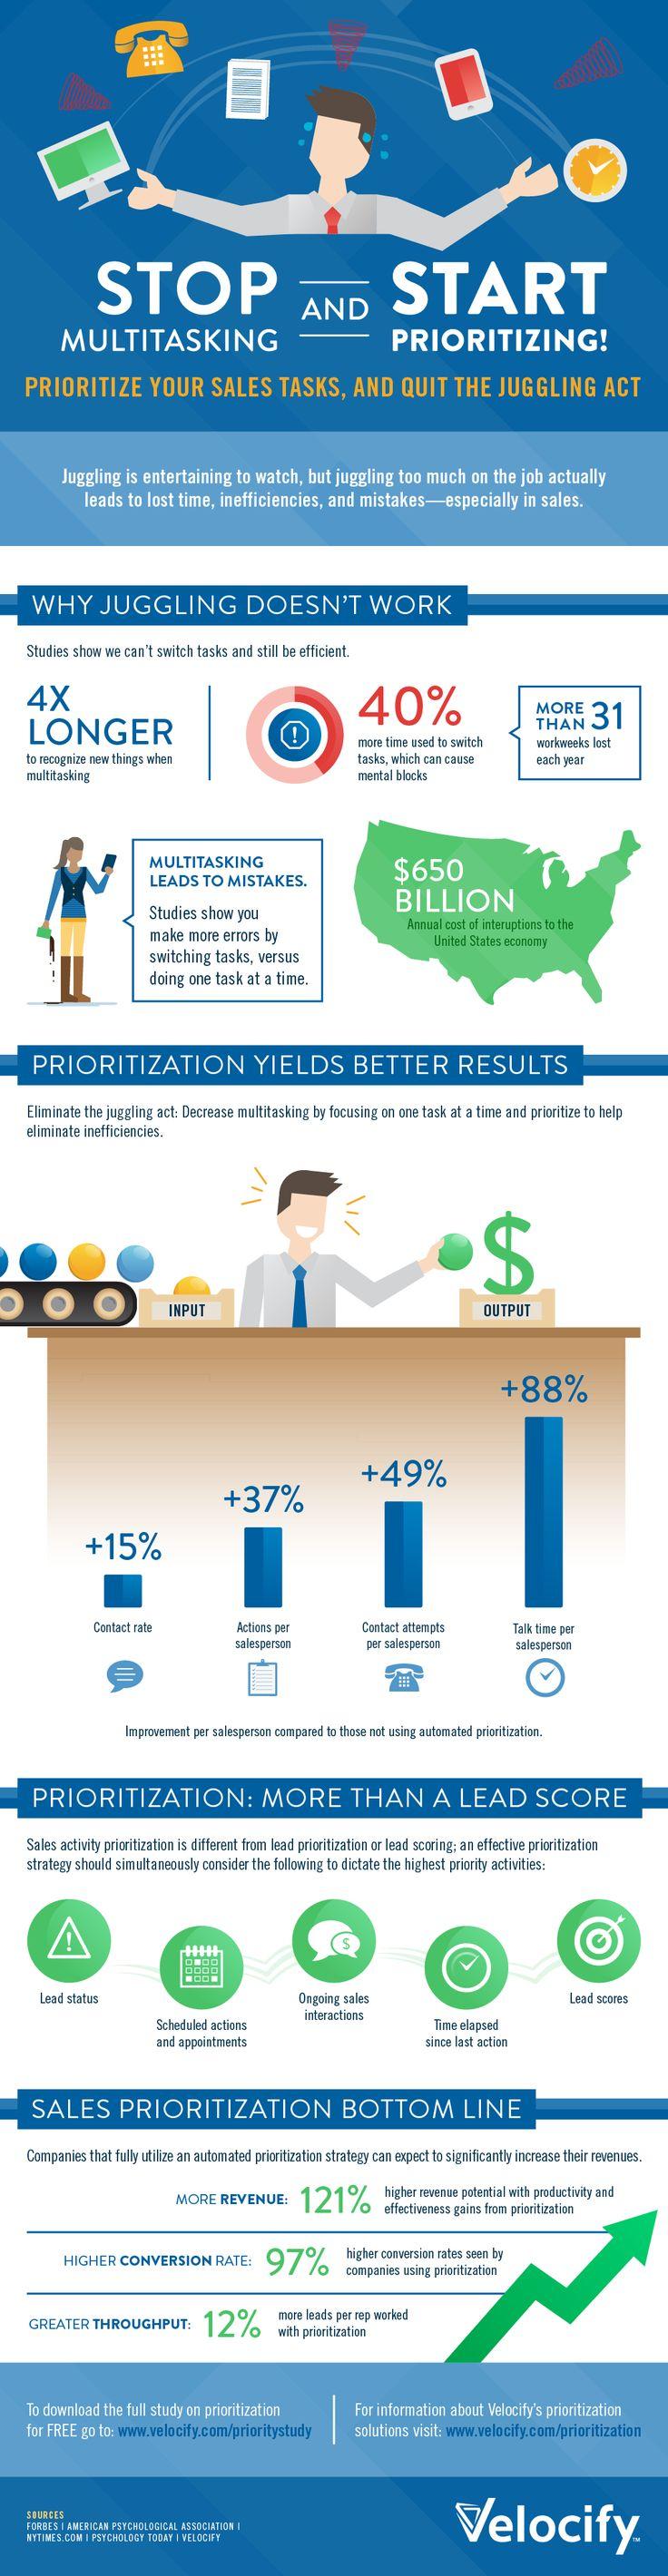 Stop Multitasking and Start Prioritizing #infographic